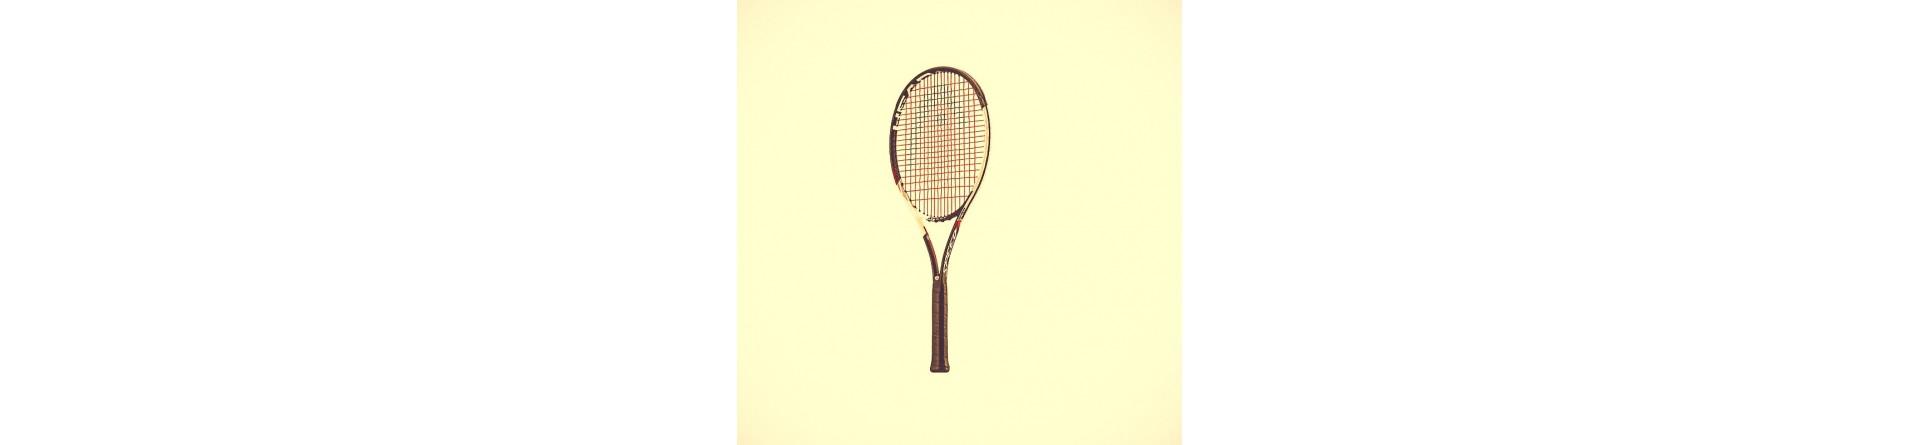 Racchette Tennis | Giuglar Shop